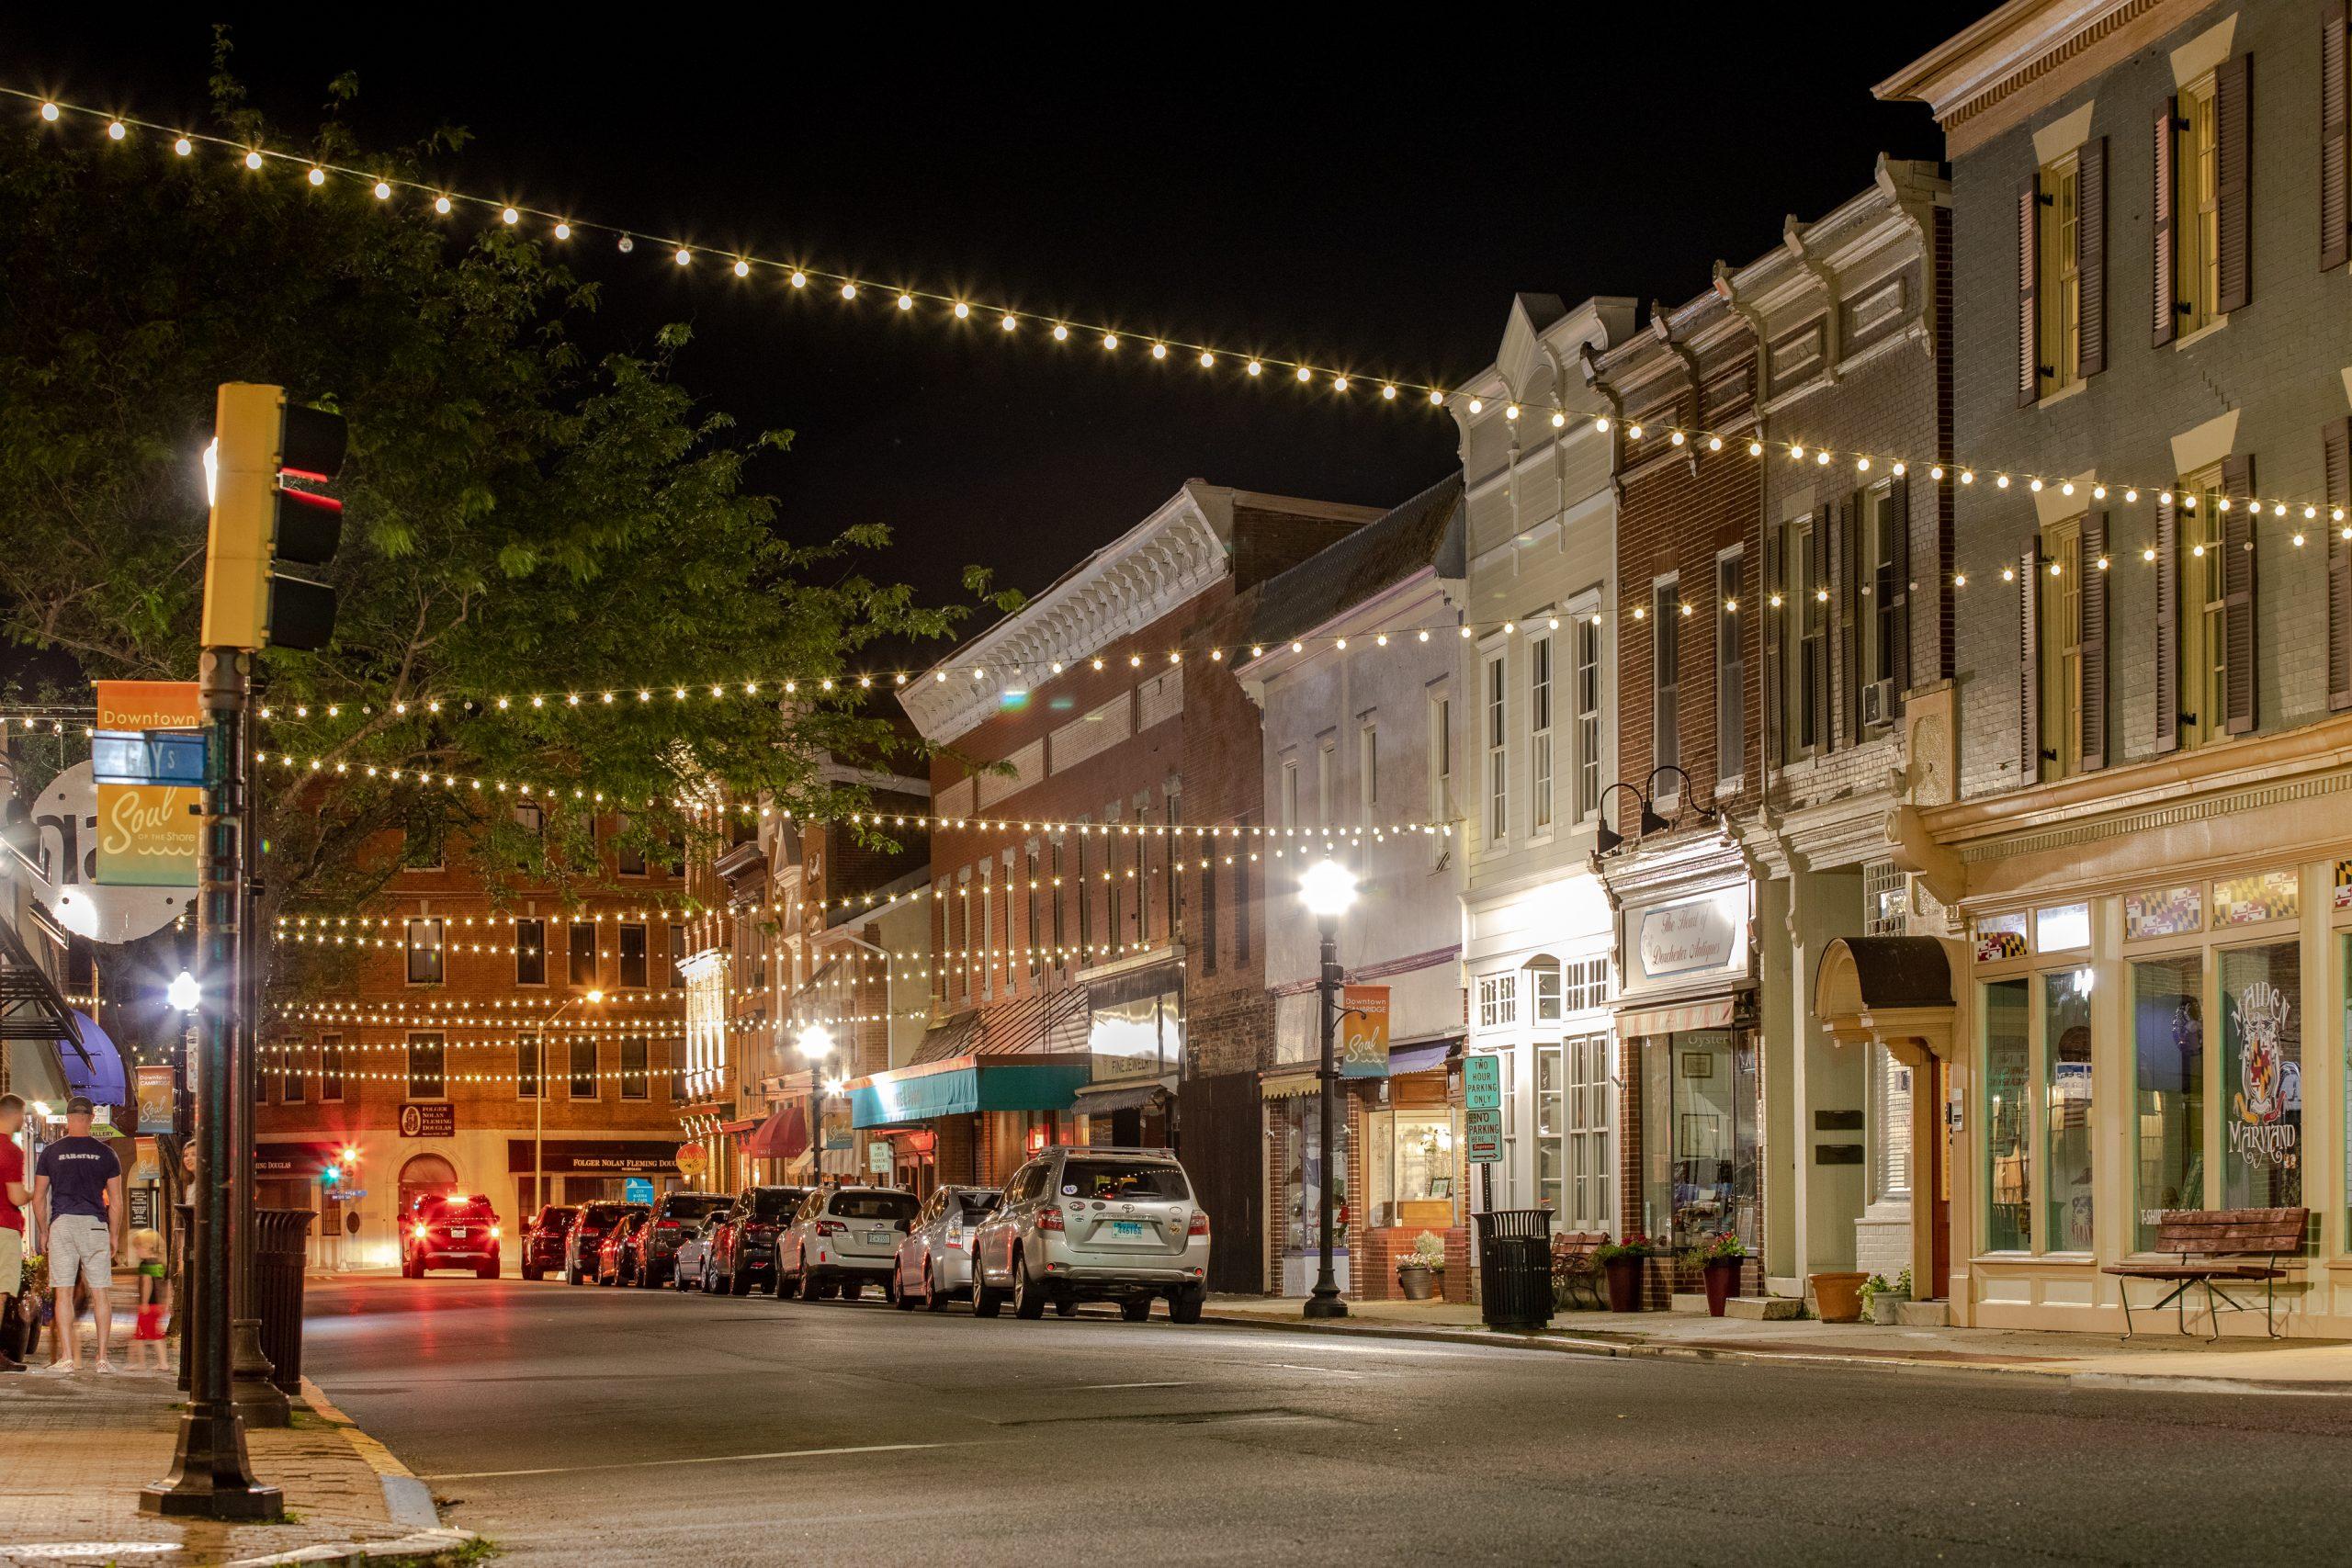 Addressing coronavirus and downtown businesses